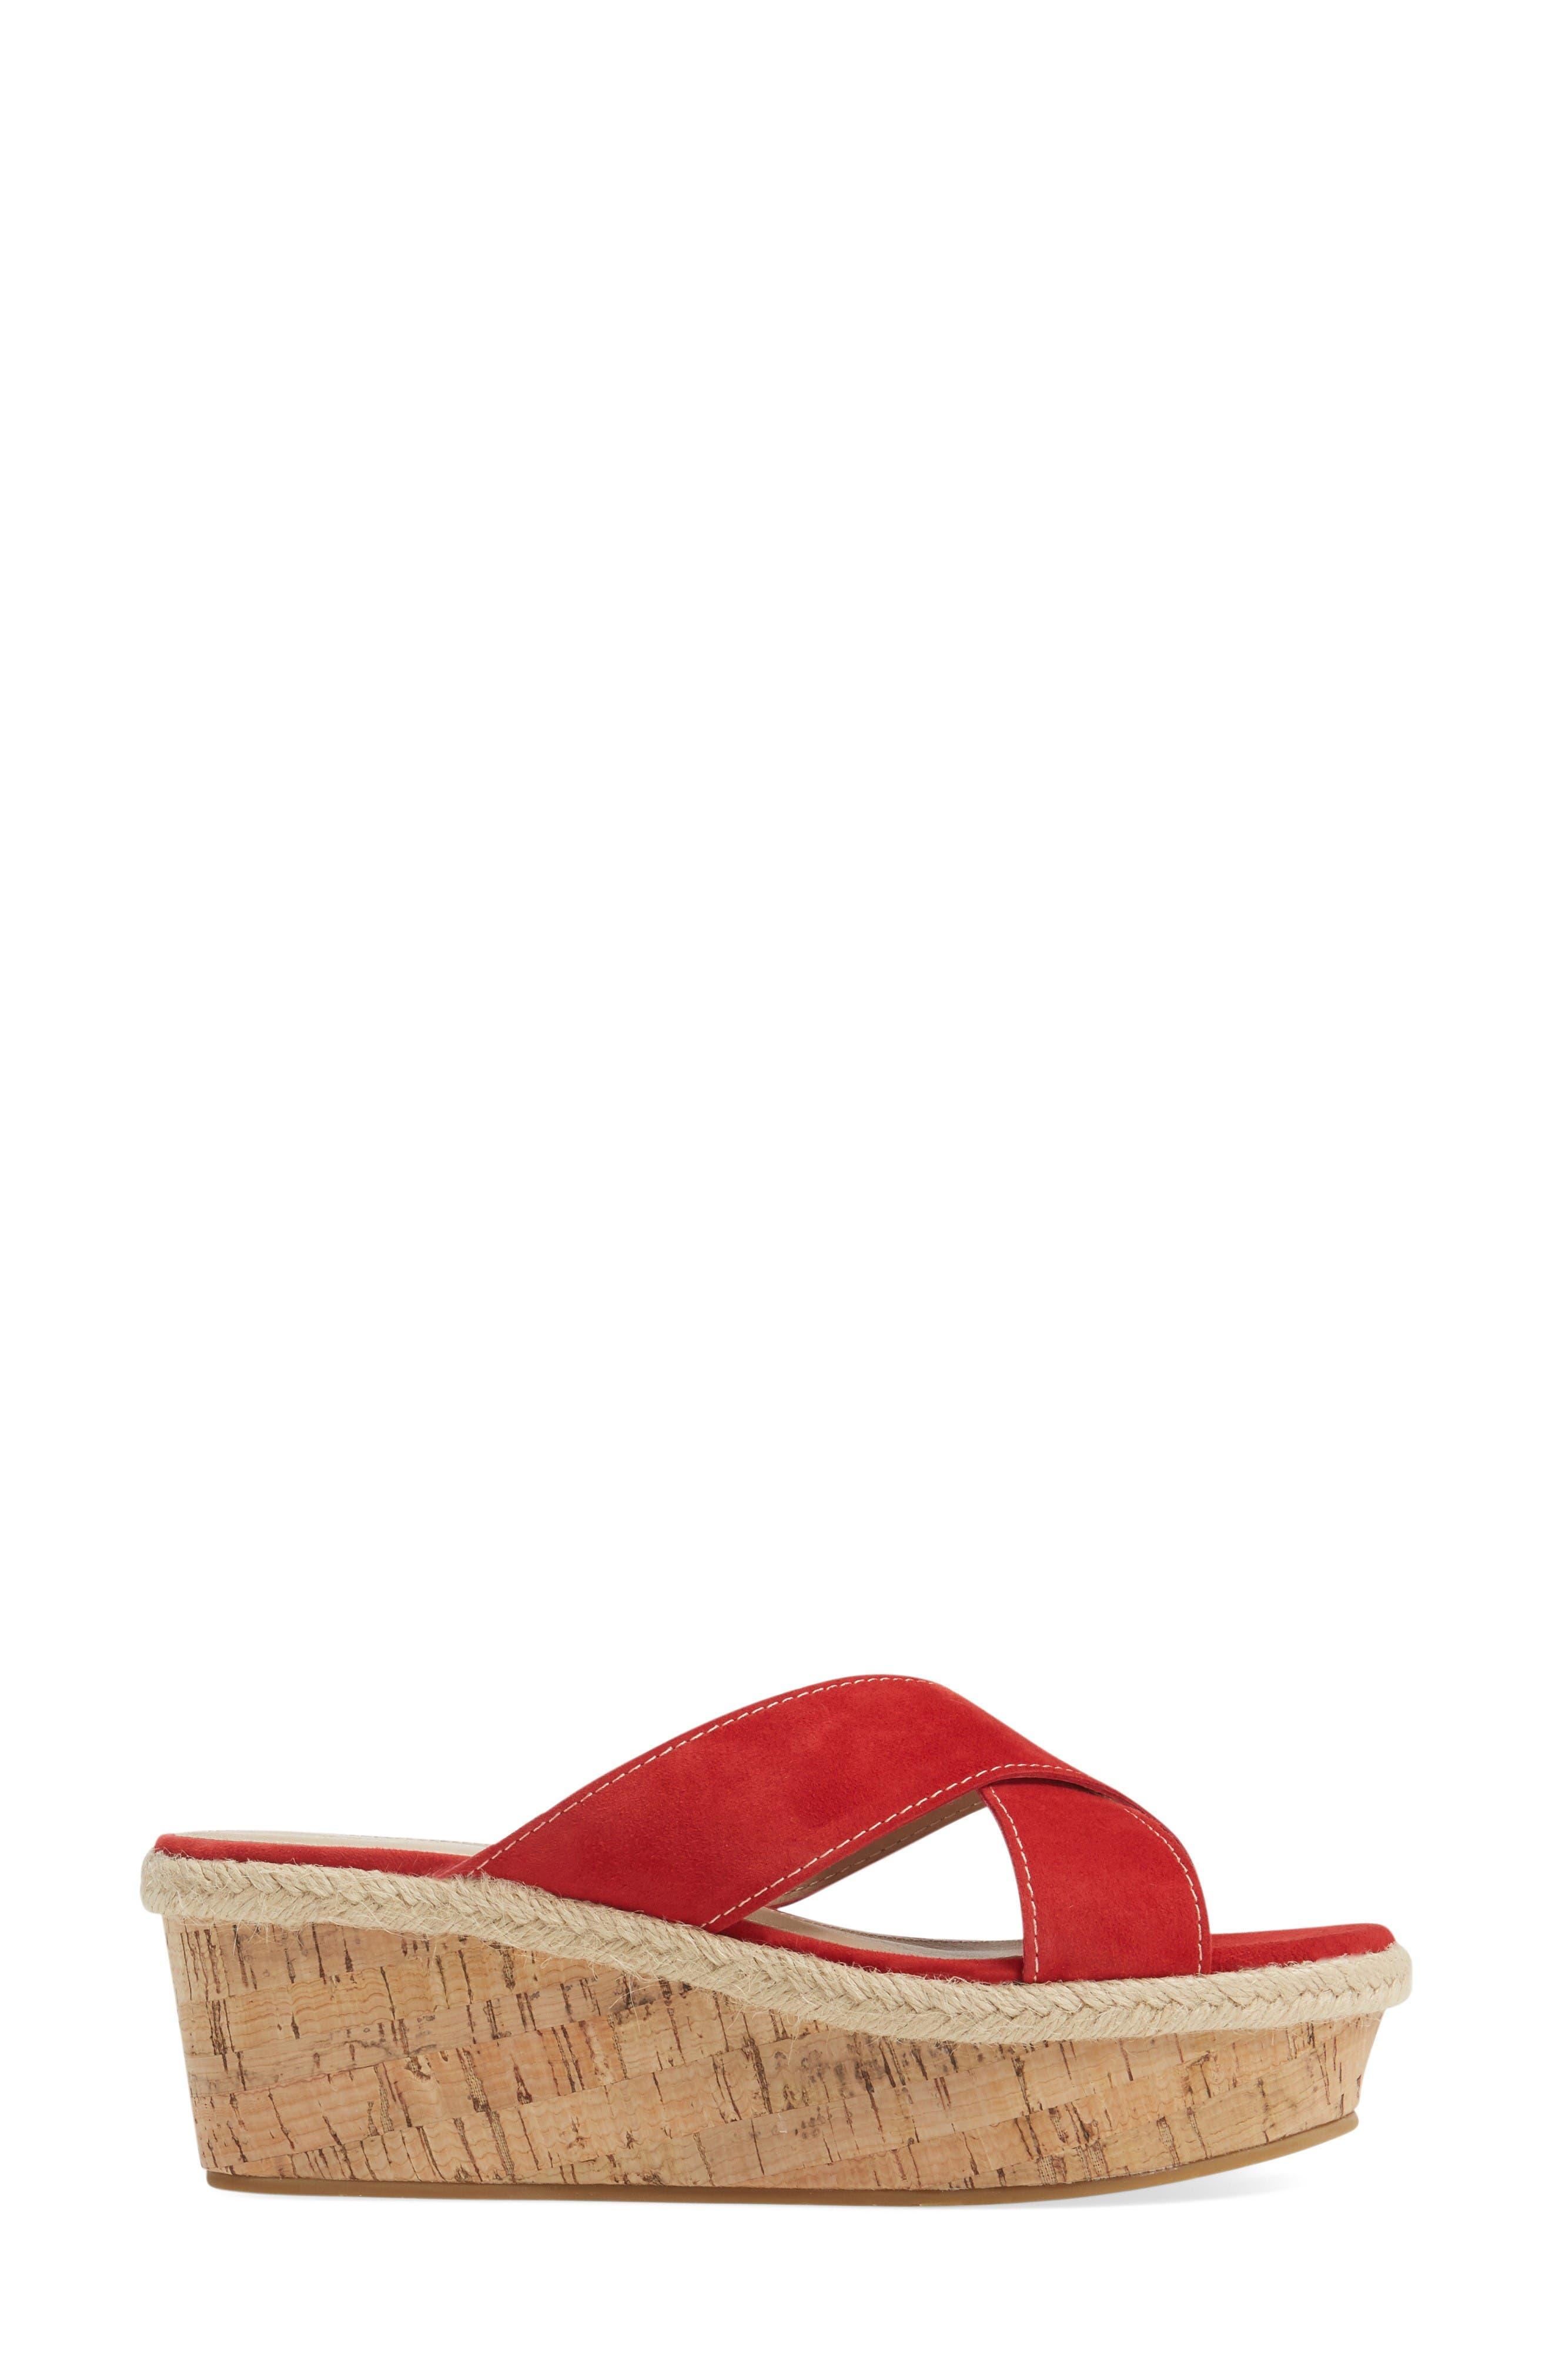 Harriet Platform Wedge Sandal,                             Alternate thumbnail 3, color,                             Lipstick Leather